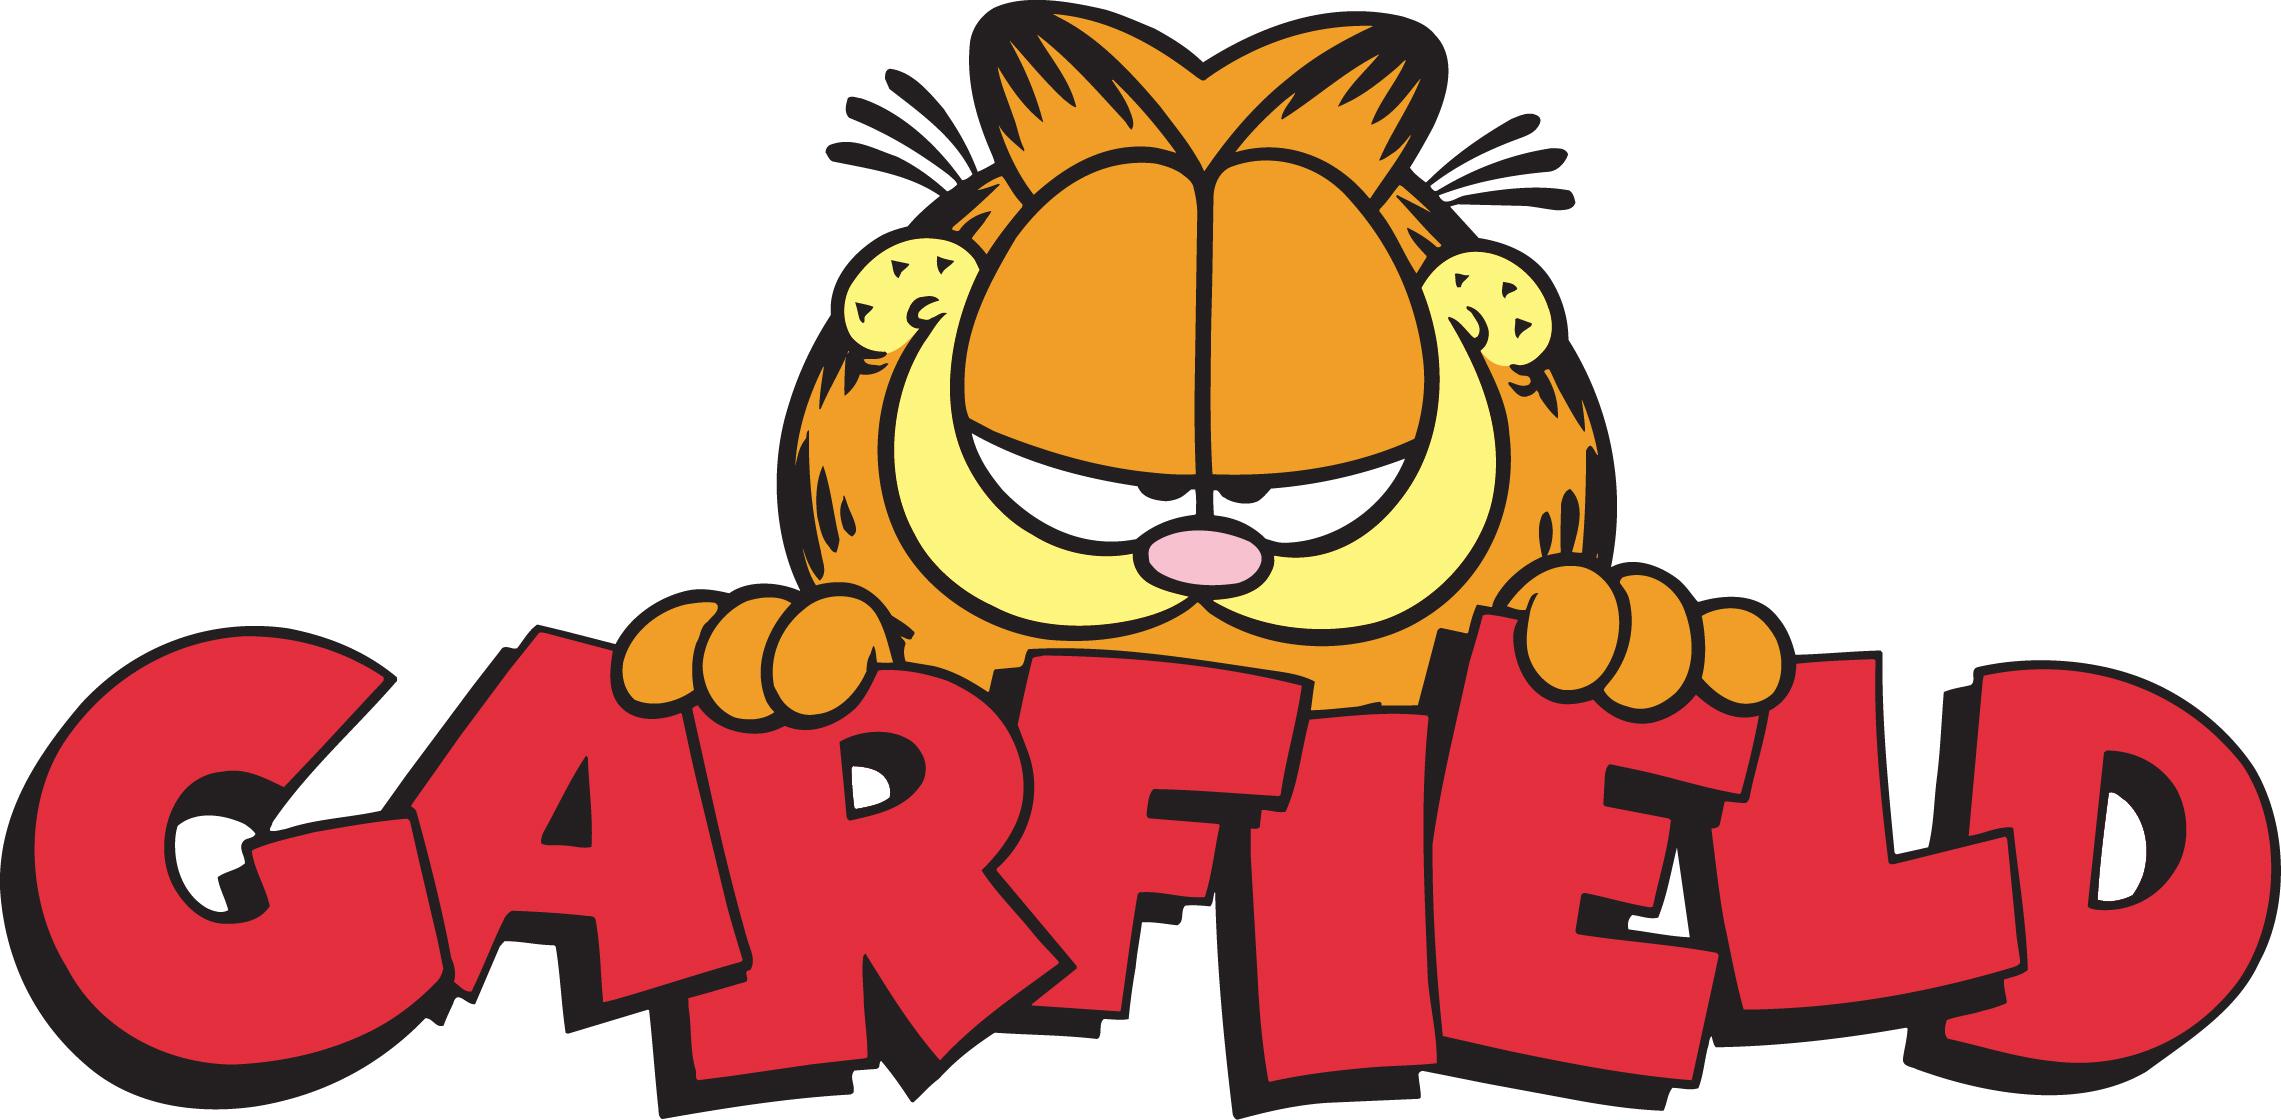 Garfield_20logo.jpg